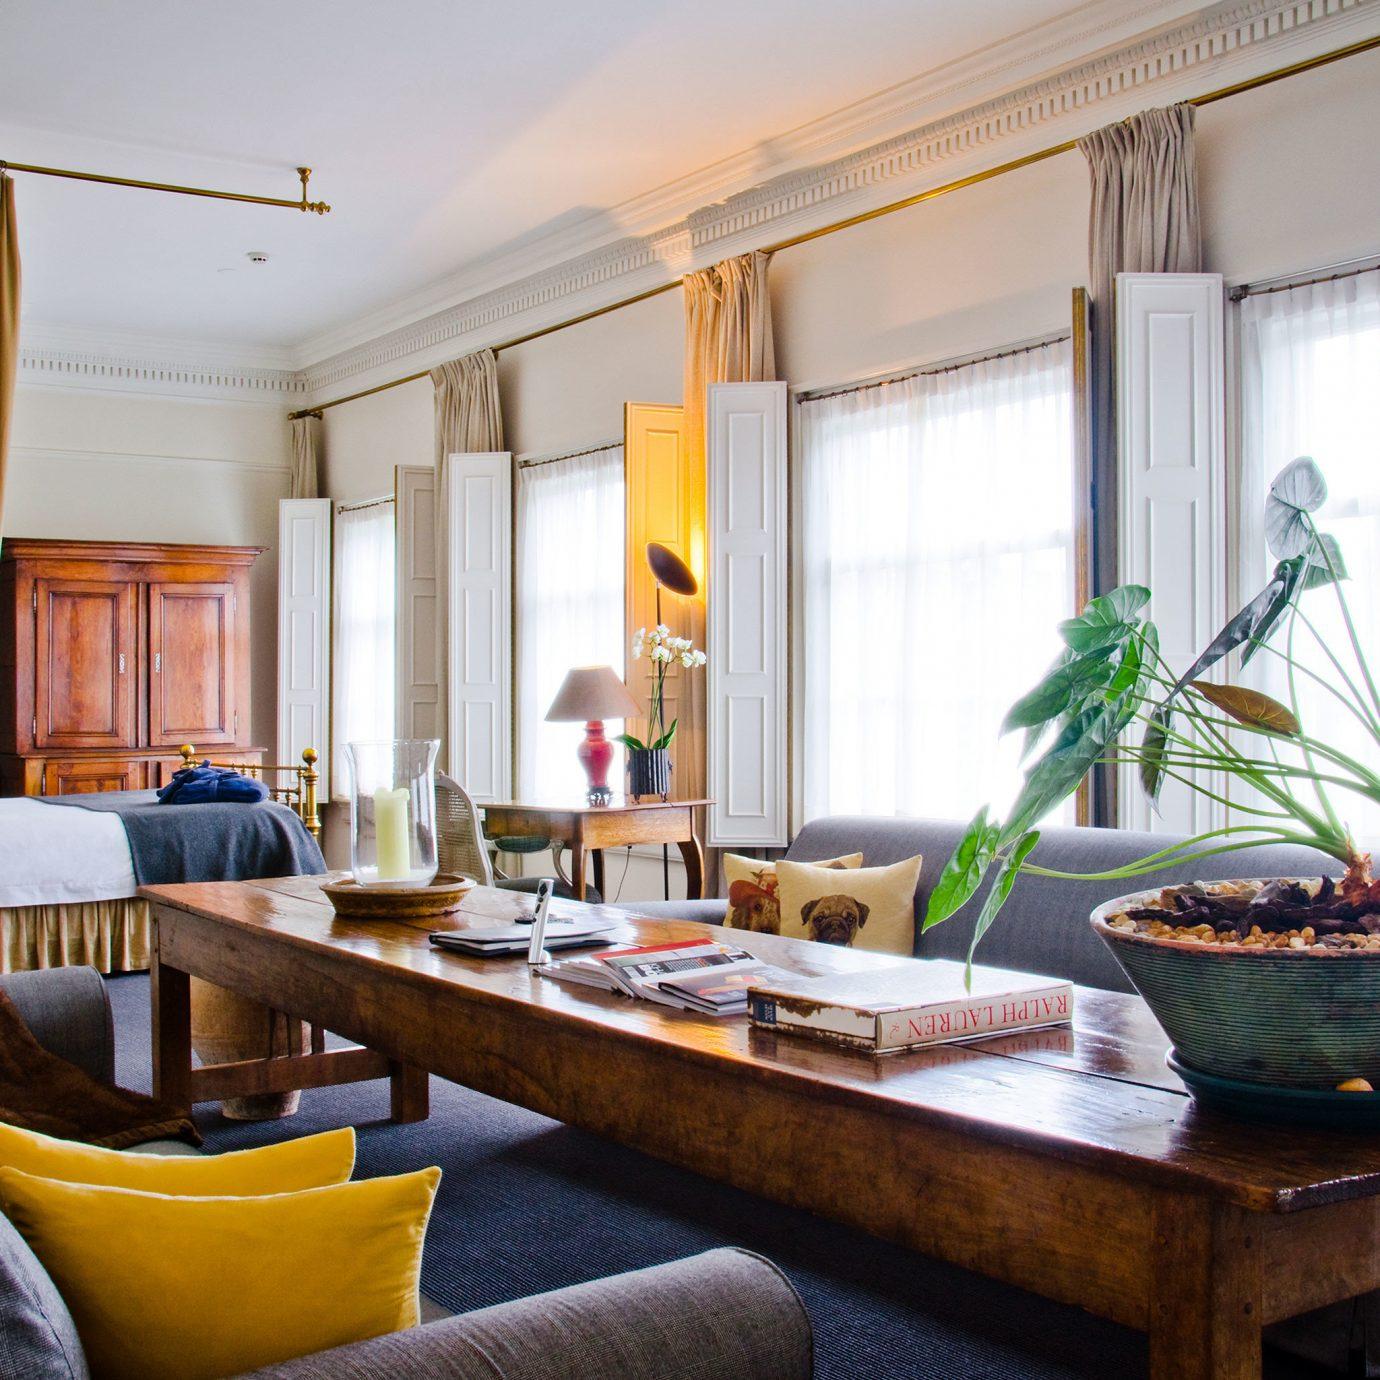 Historic Lounge Luxury Scenic views property living room home condominium house Suite Villa cottage mansion